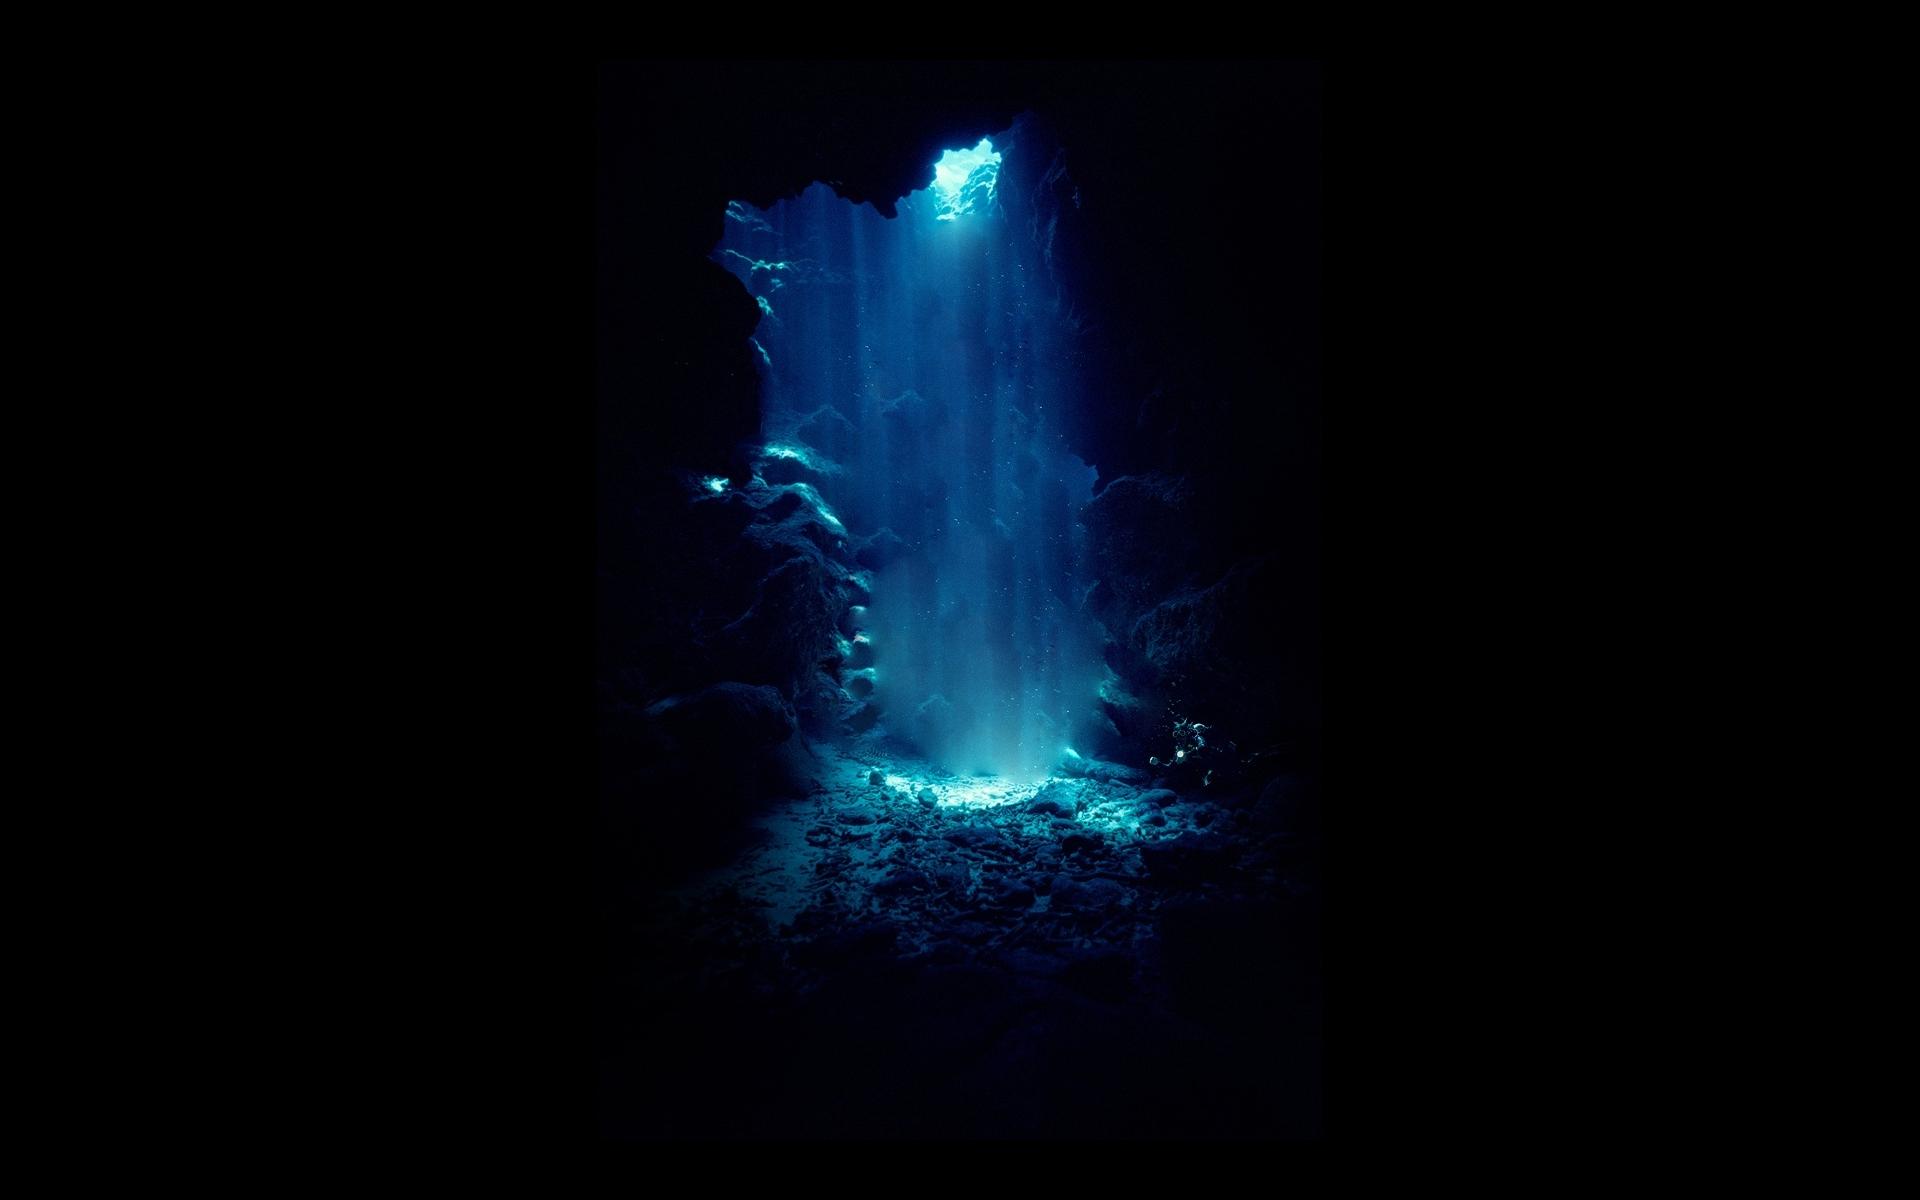 Black Blue Wallpaper 1920x1200 Black Blue Dive Underwater 1920x1200